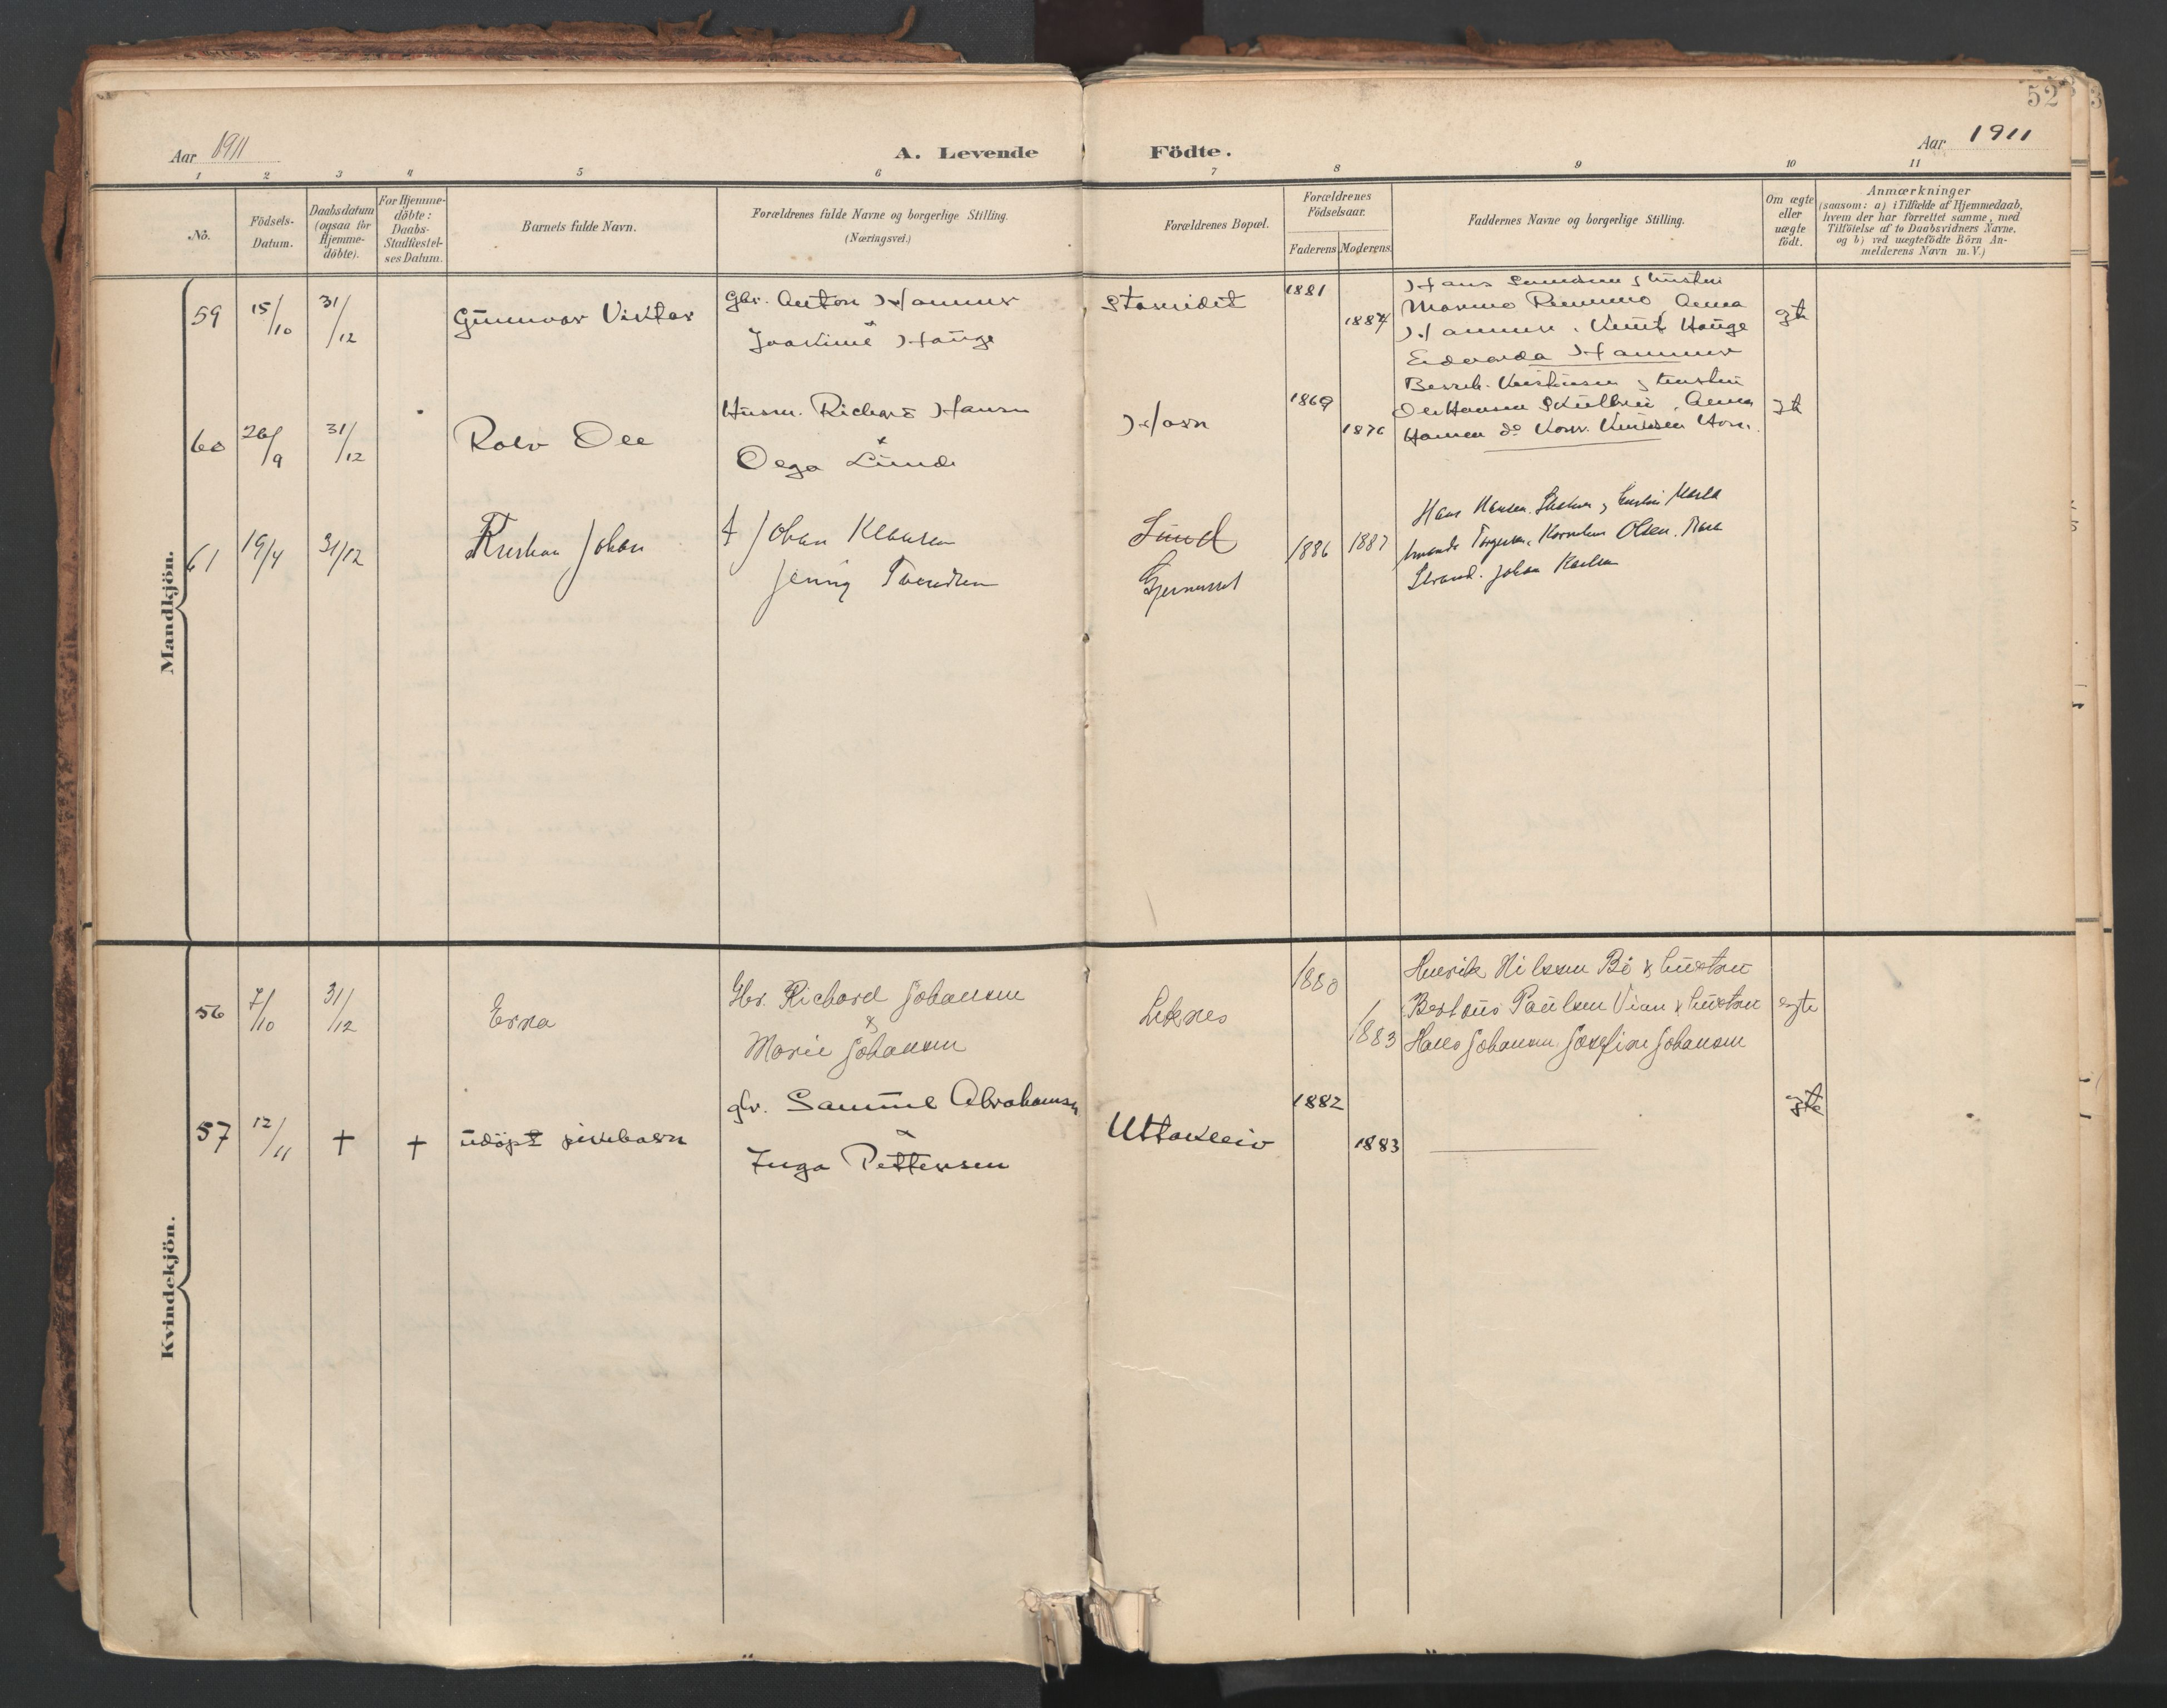 SAT, Ministerialprotokoller, klokkerbøker og fødselsregistre - Nordland, 881/L1154: Ministerialbok nr. 881A07, 1907-1918, s. 52